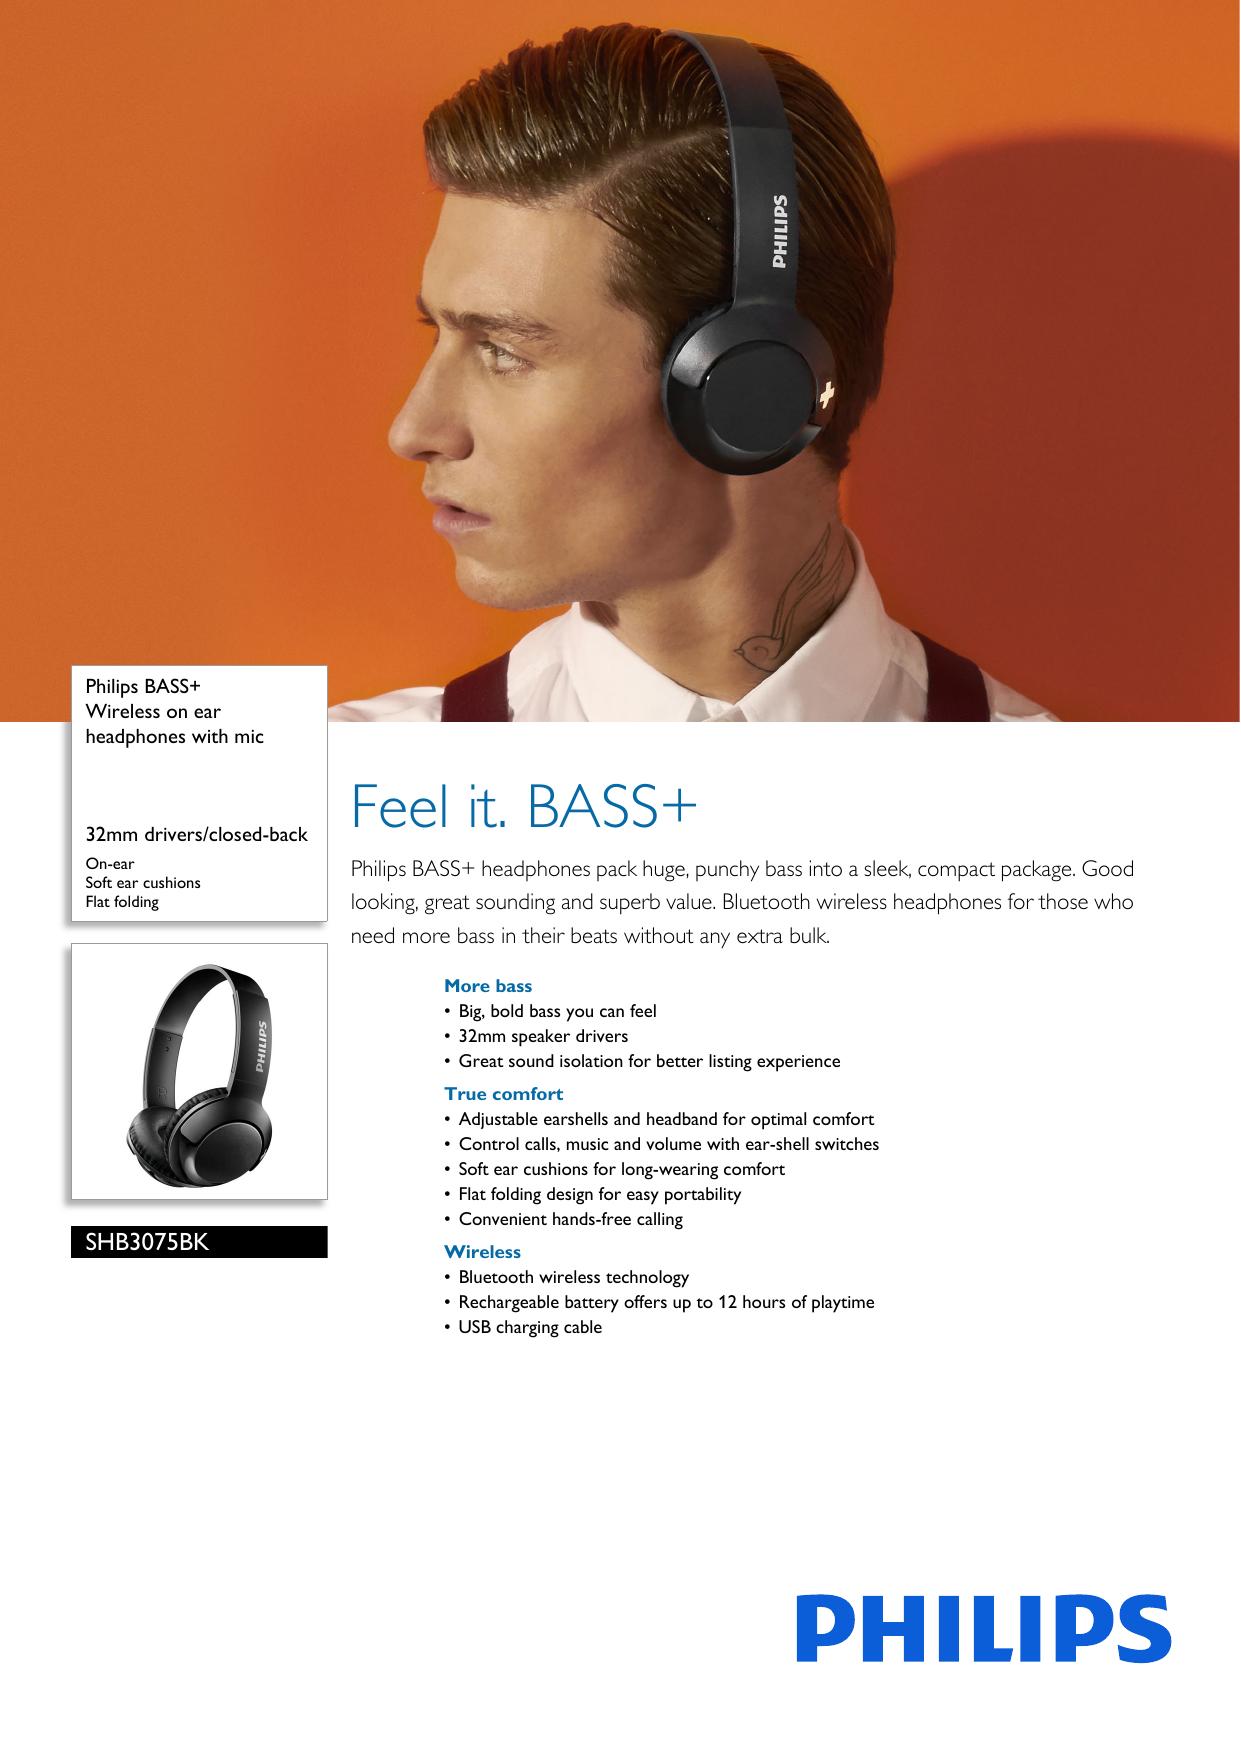 Shb3075bk 00 Philips Wireless On Ear Headphones With Mic Manualzz